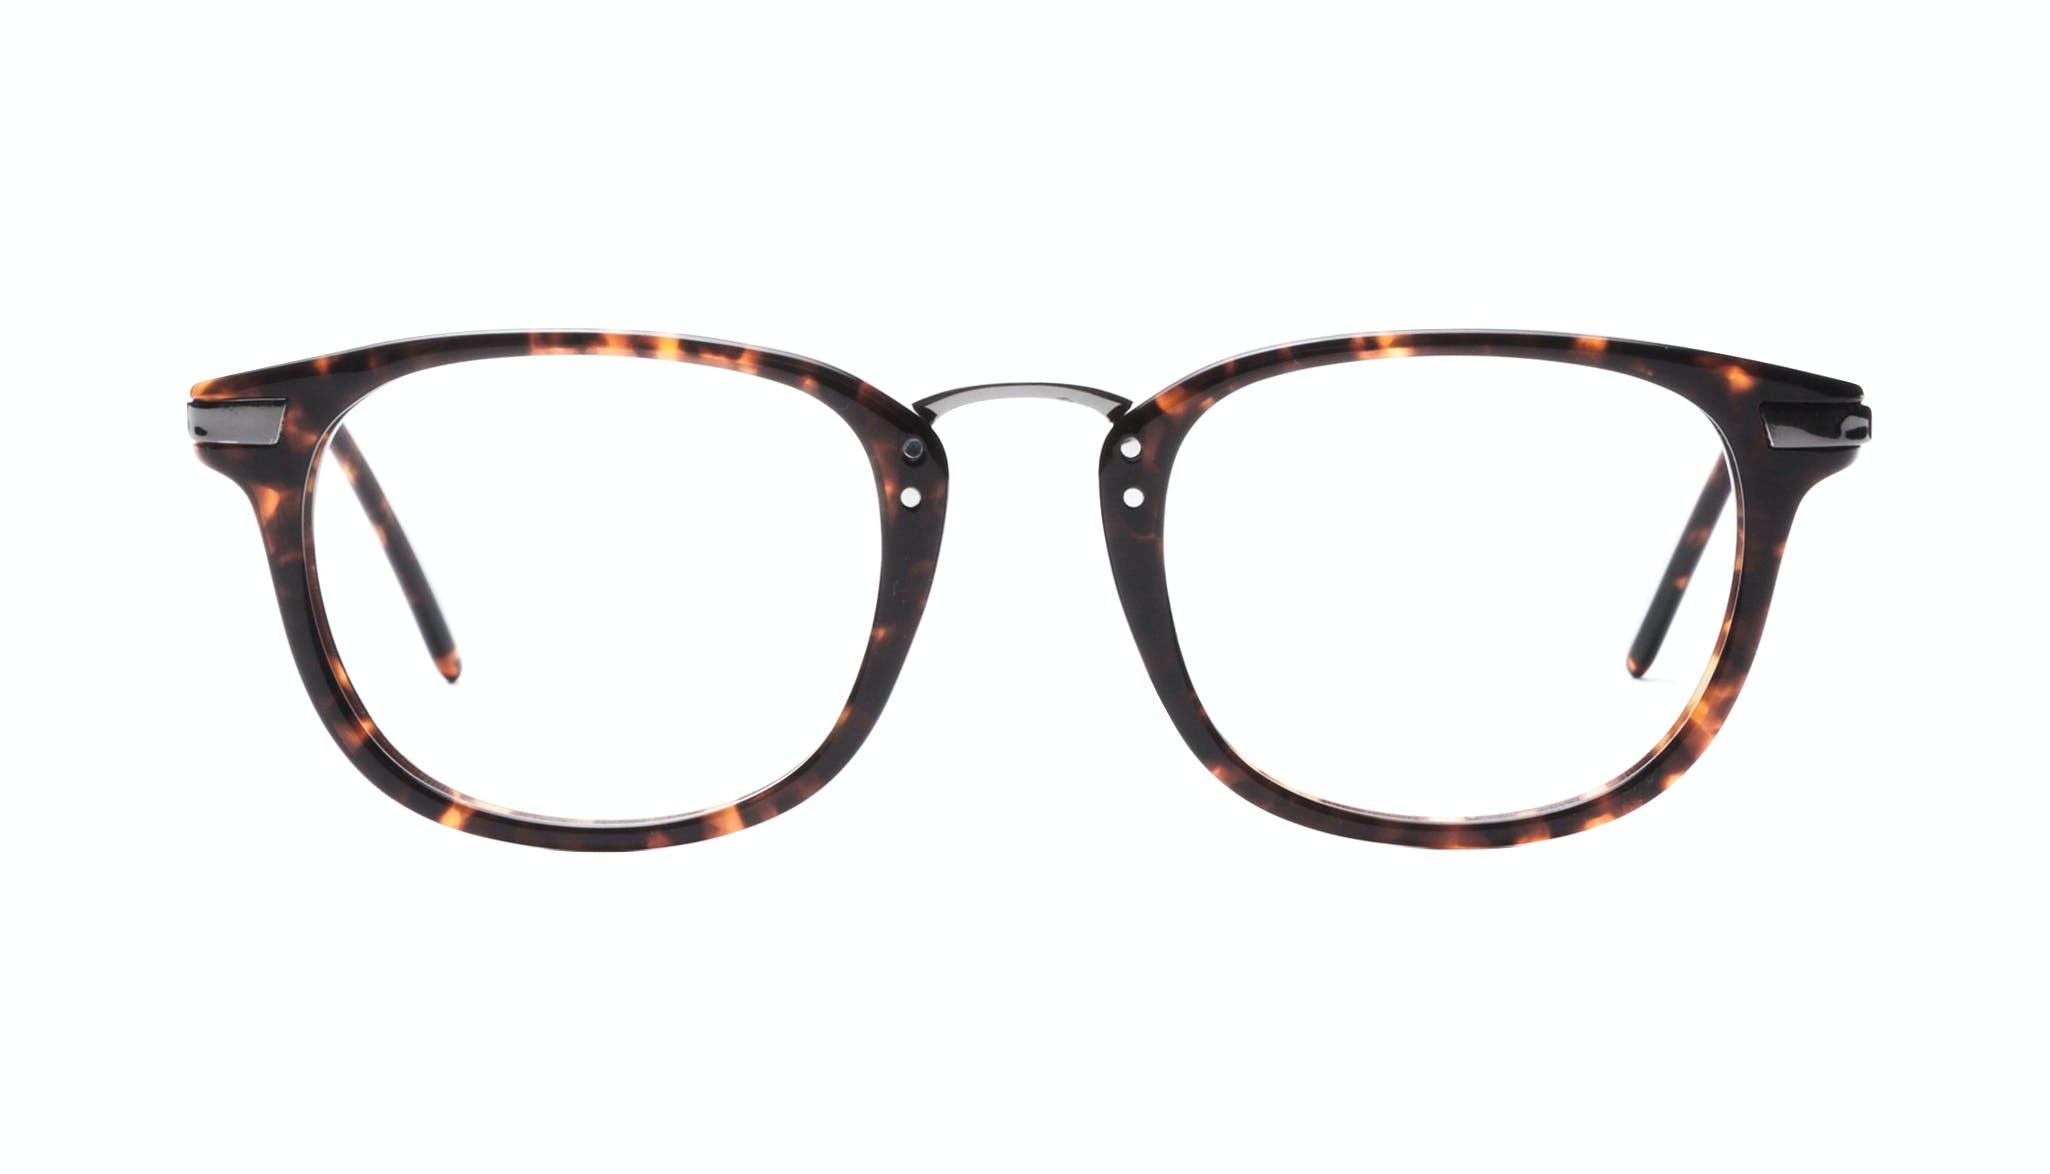 Affordable Fashion Glasses Rectangle Square Eyeglasses Men Daze Sepia Front